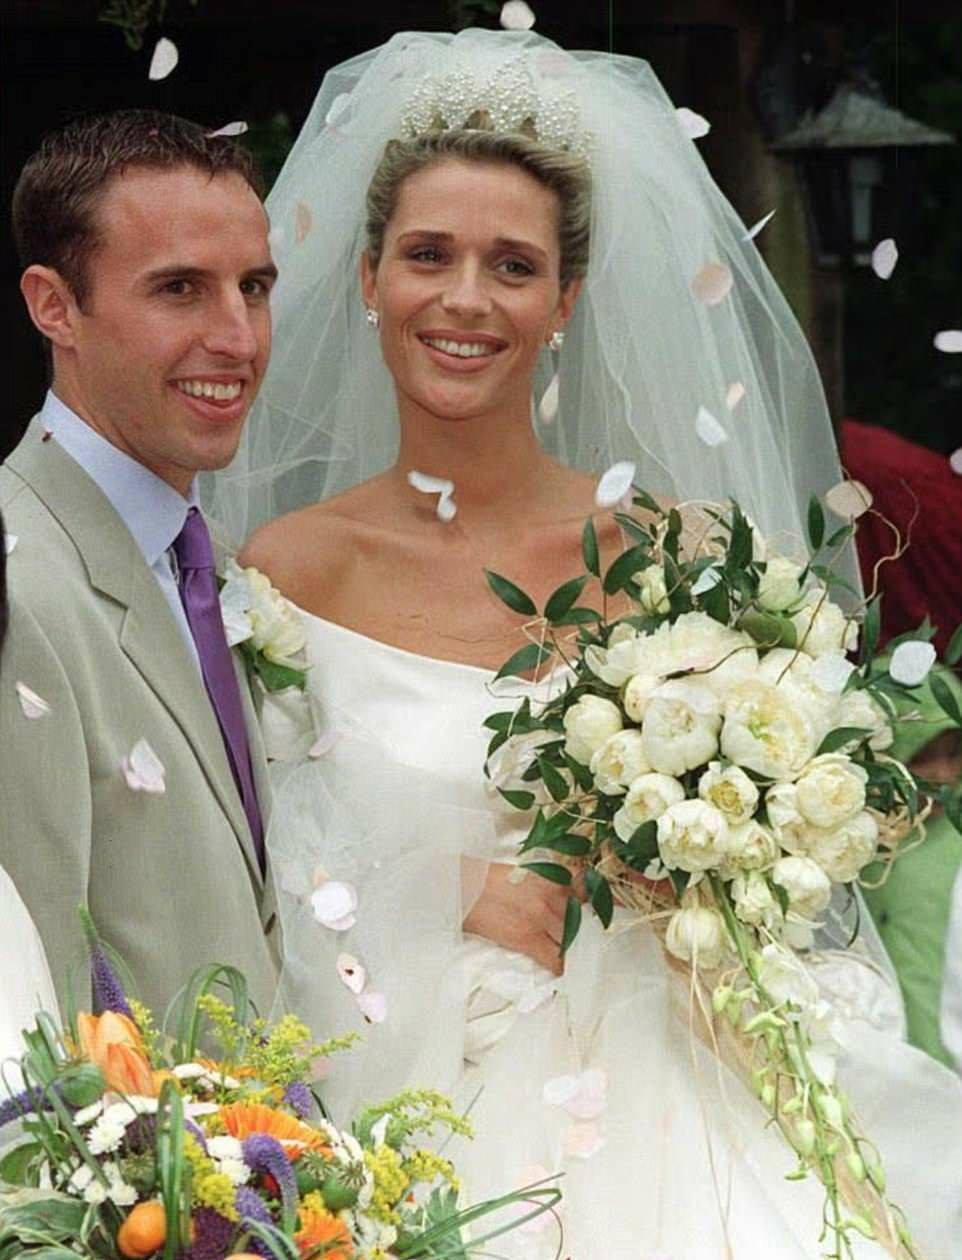 GARETH SOUTHGATE,ALISON SOUTHGATE,WEDDING